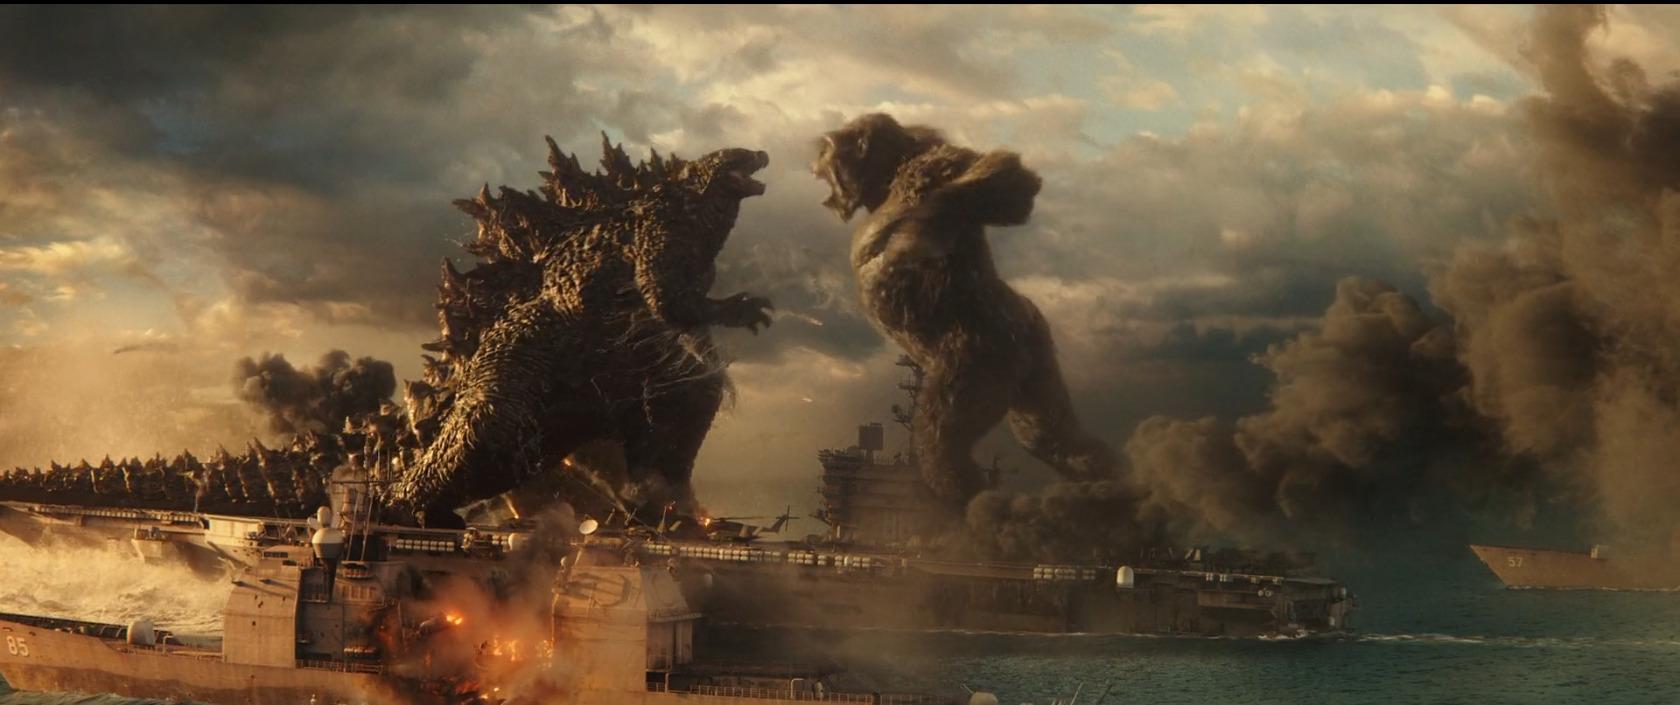 Recensione Godzilla vs Kong film Monsterverse